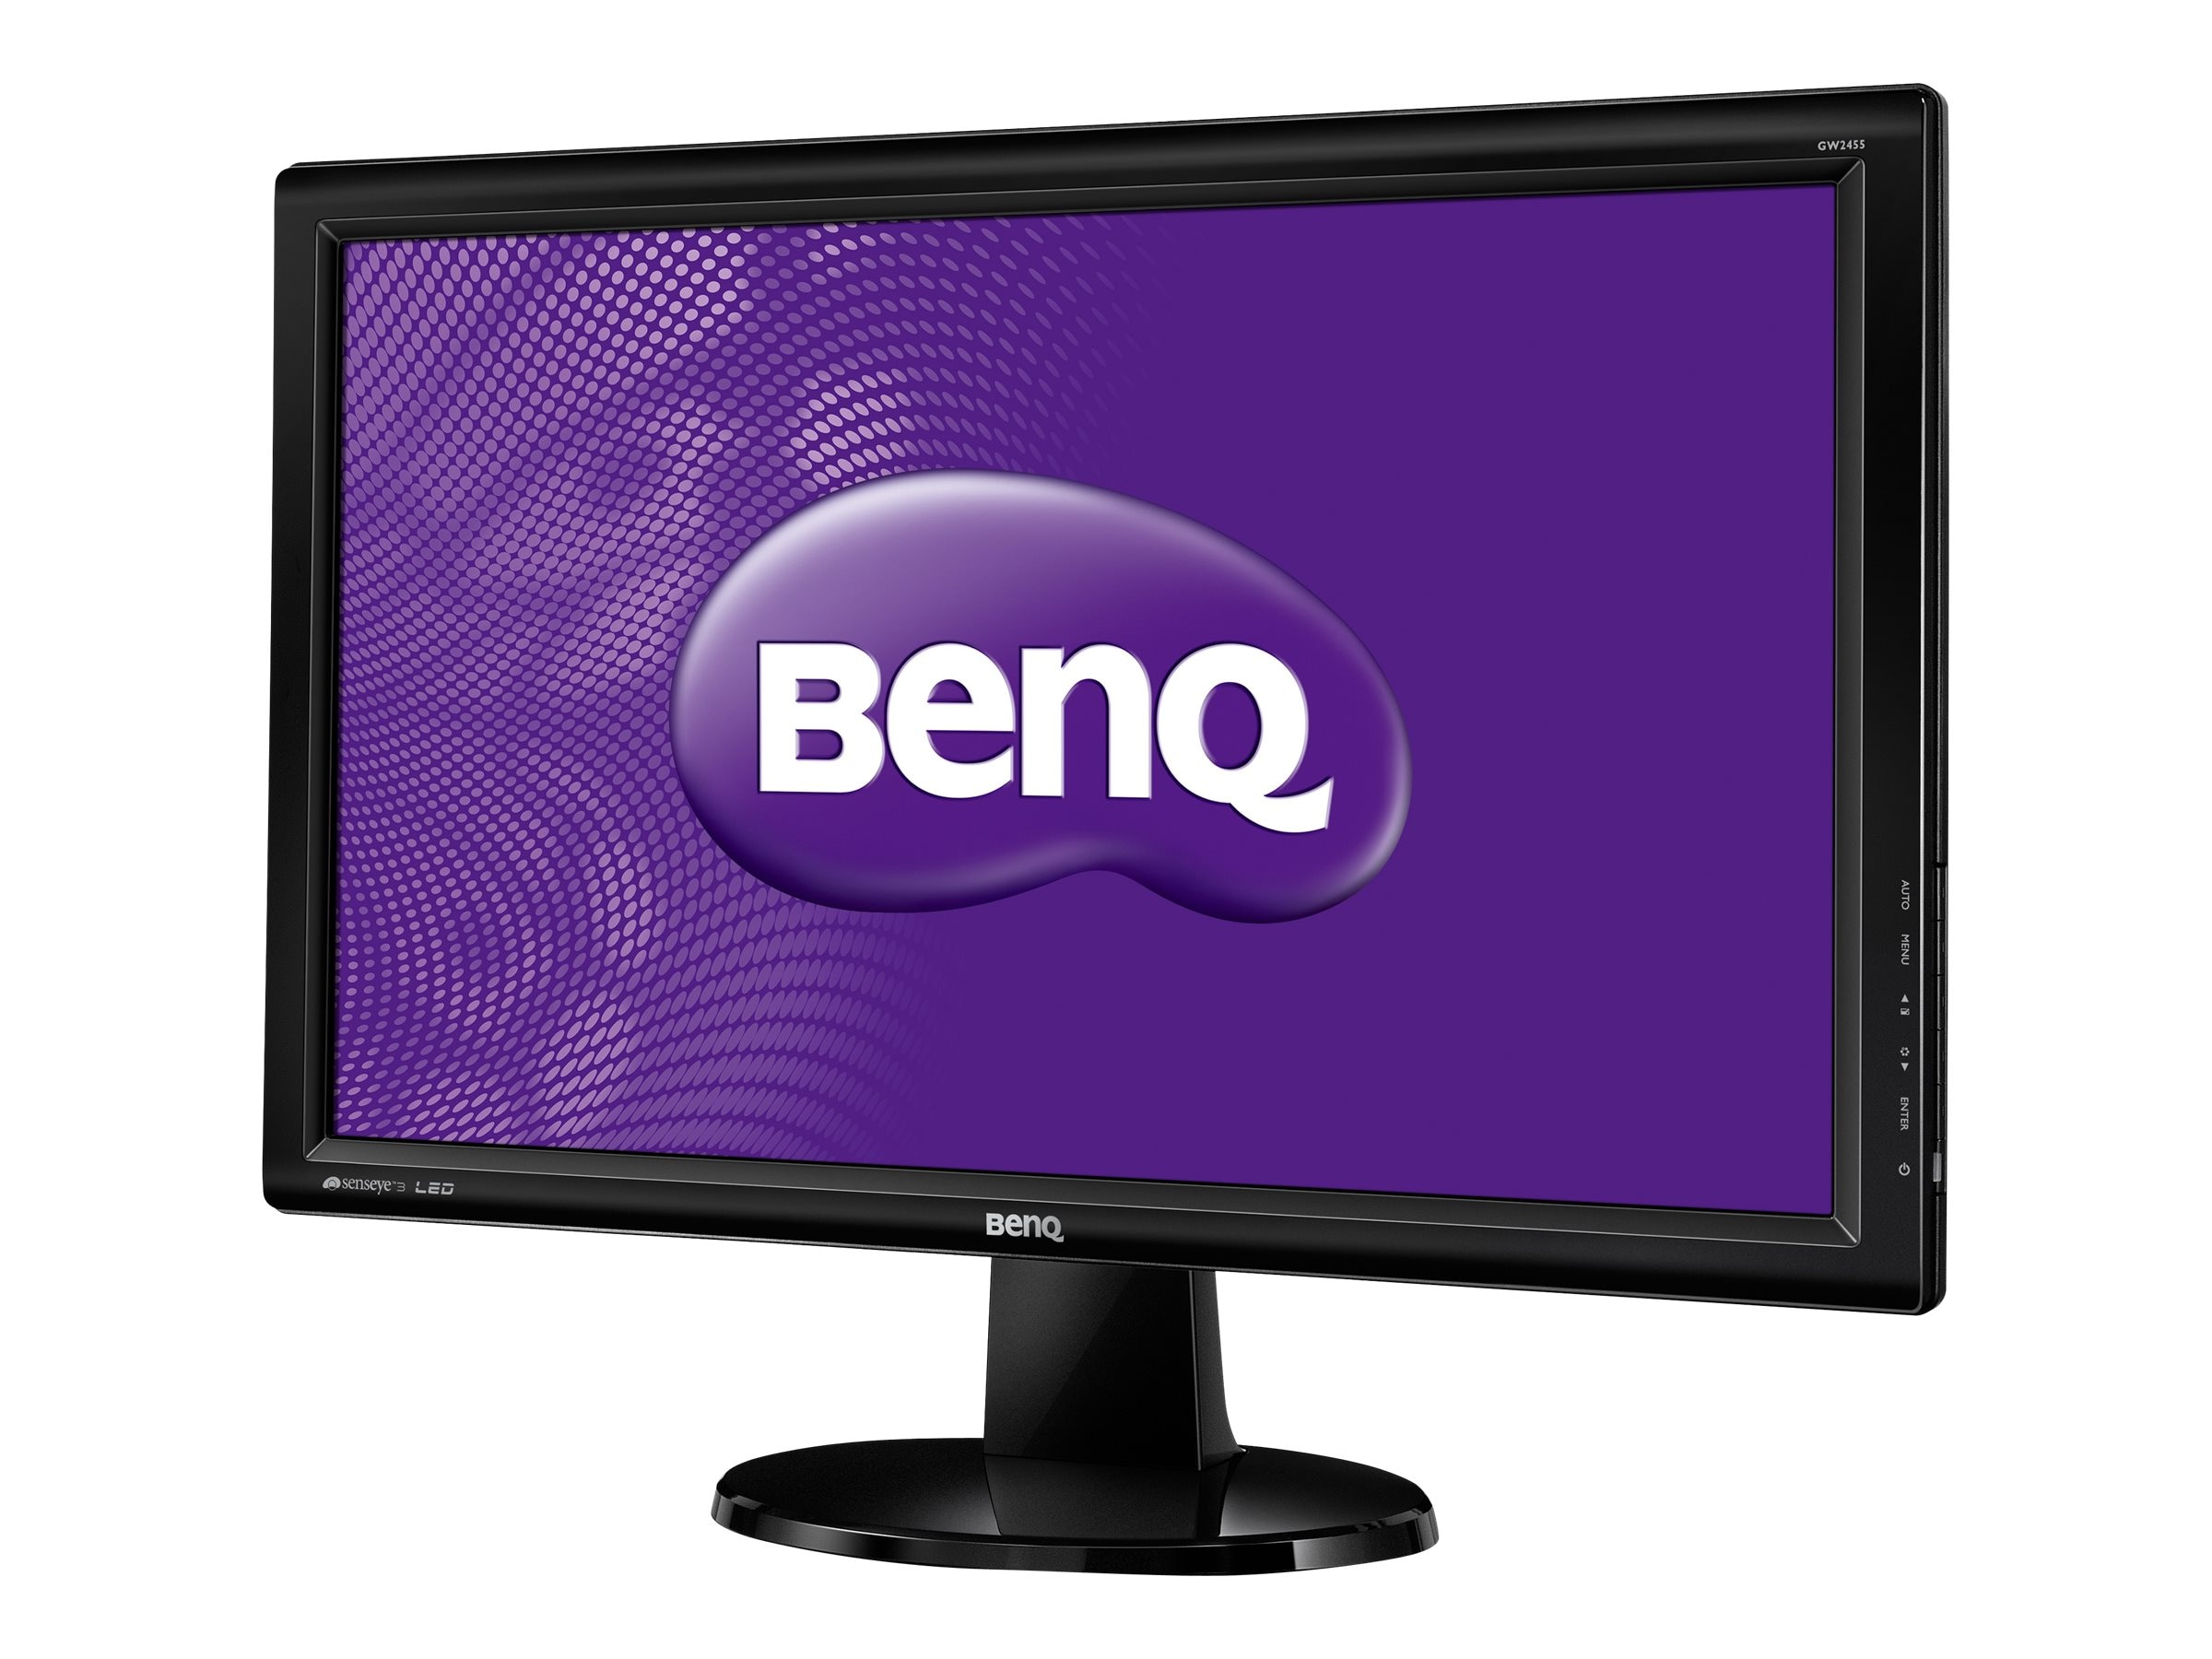 Benq GW2455H Image 3